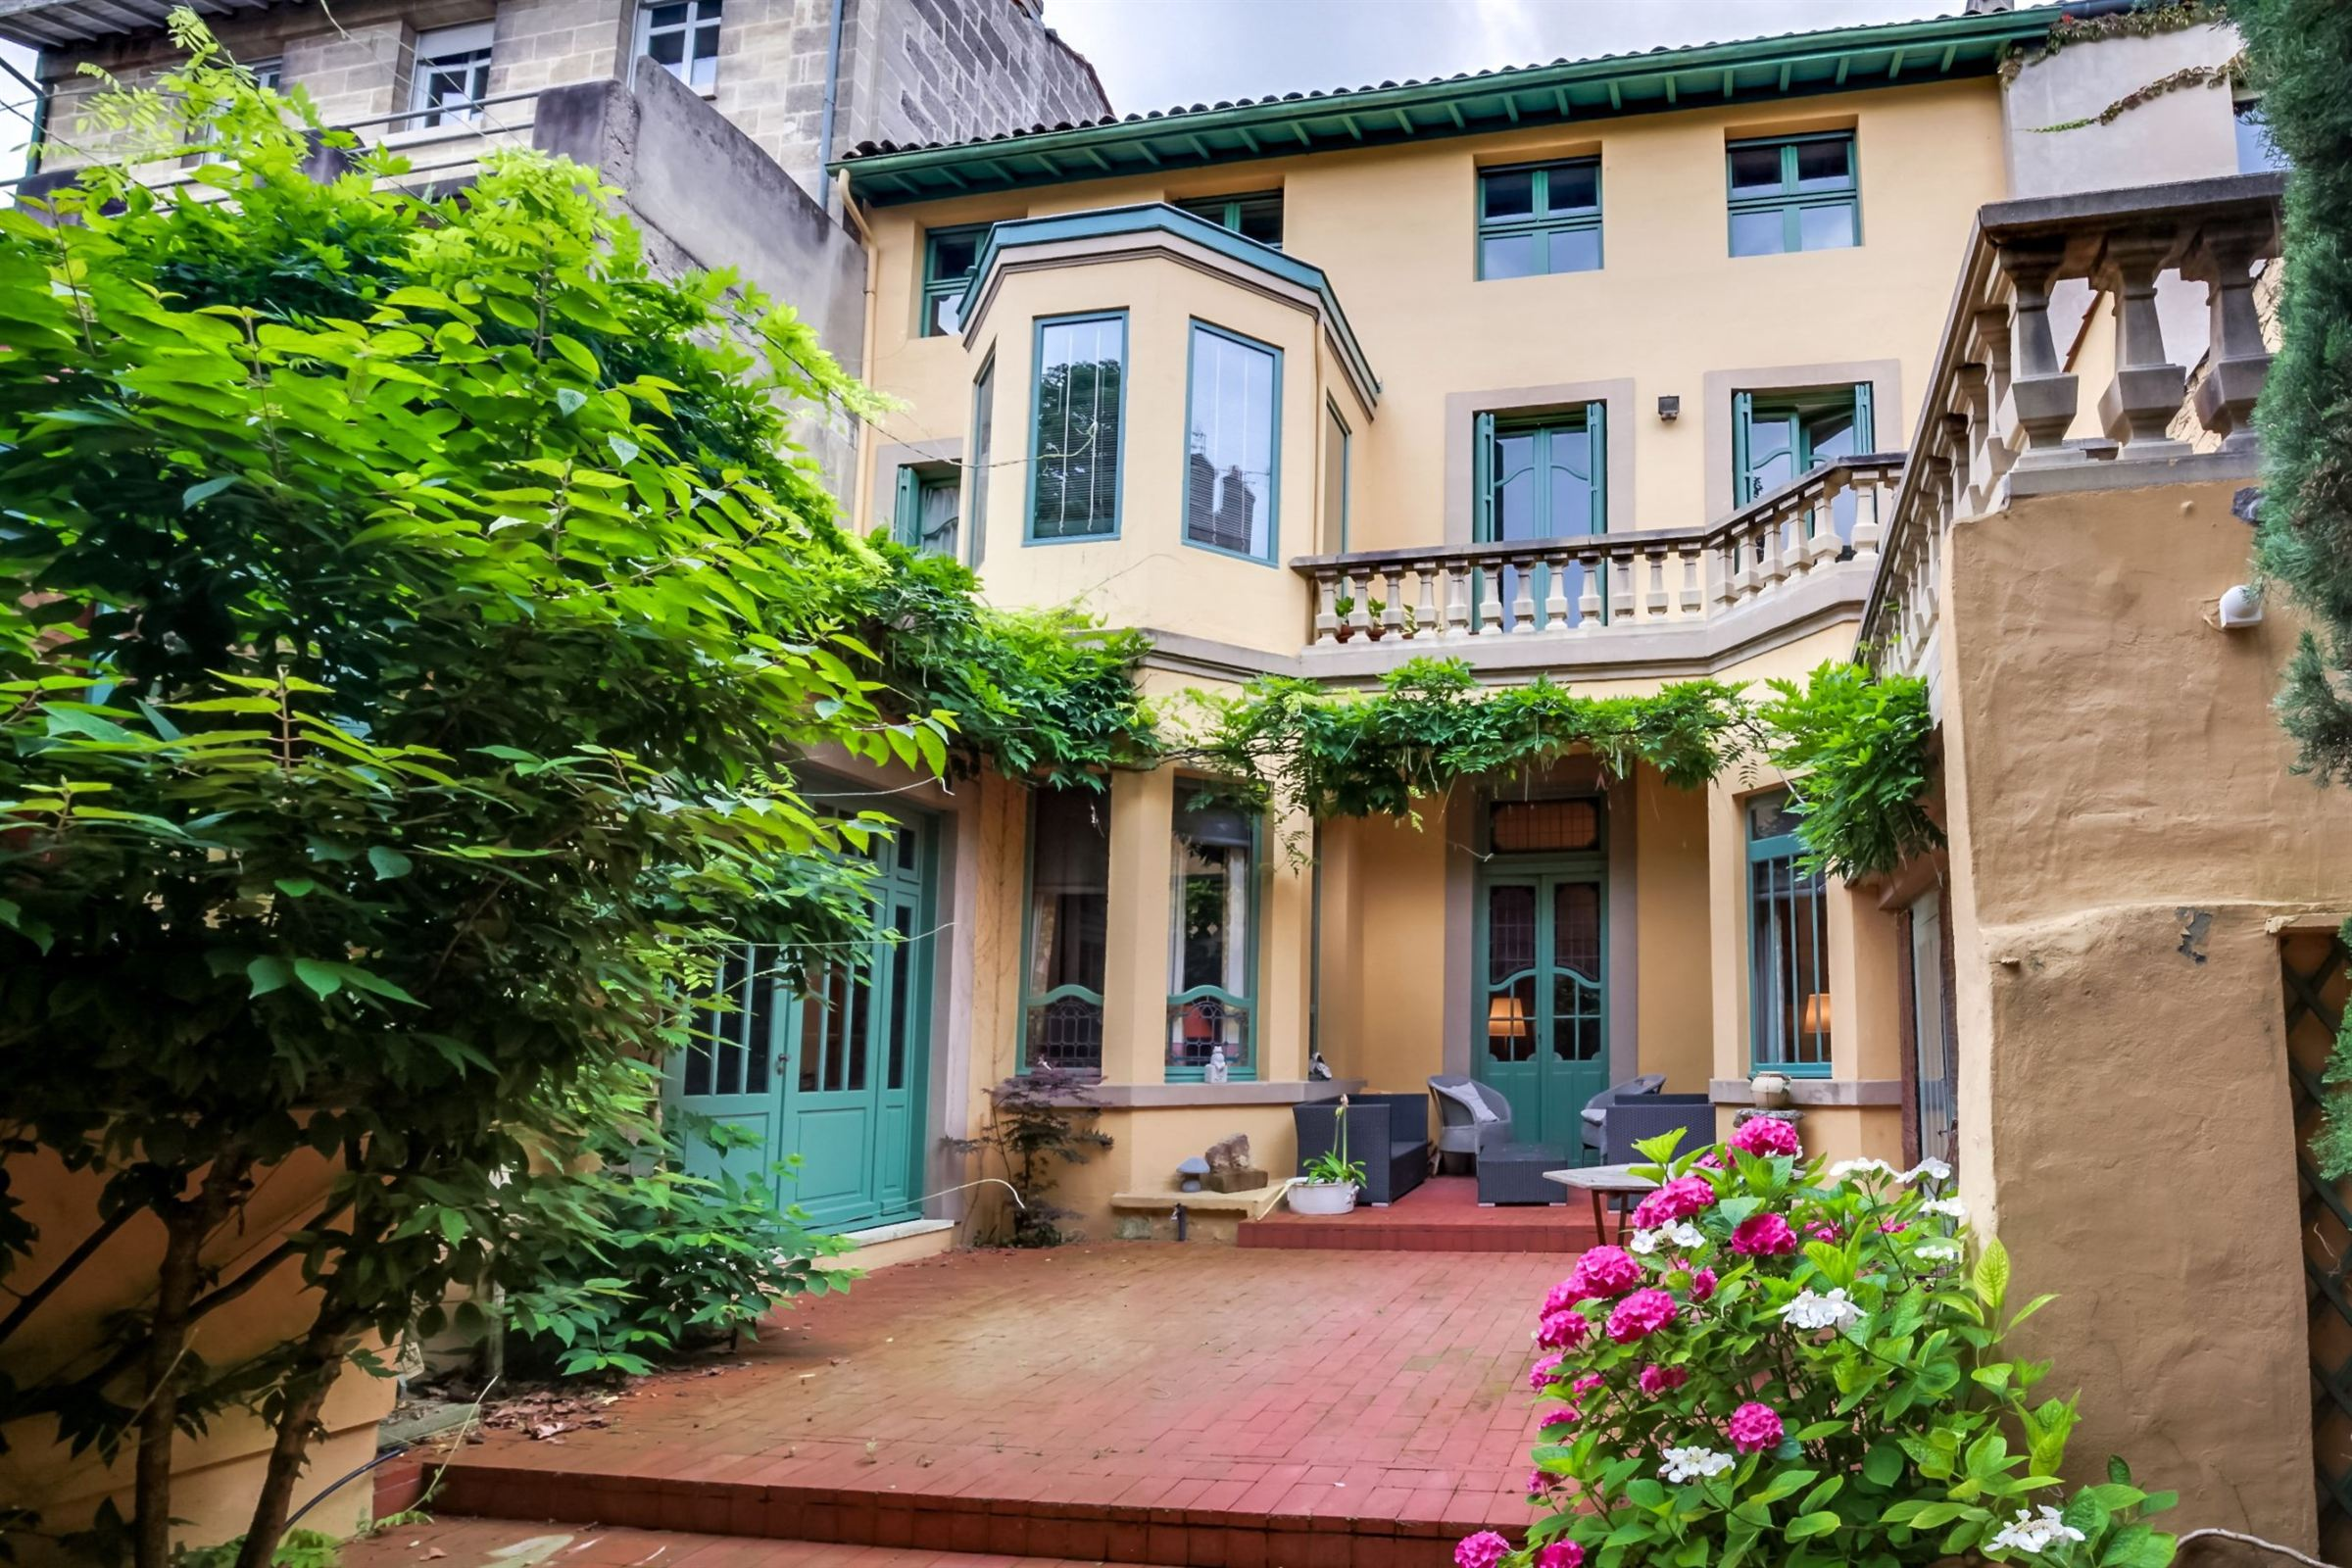 Casa Unifamiliar por un Venta en BORDEAUX ST SEURIN DISTRICT VERY NICE PRIVATE LUXURY TOWNHOUSE Bordeaux, Aquitania, 33000 Francia